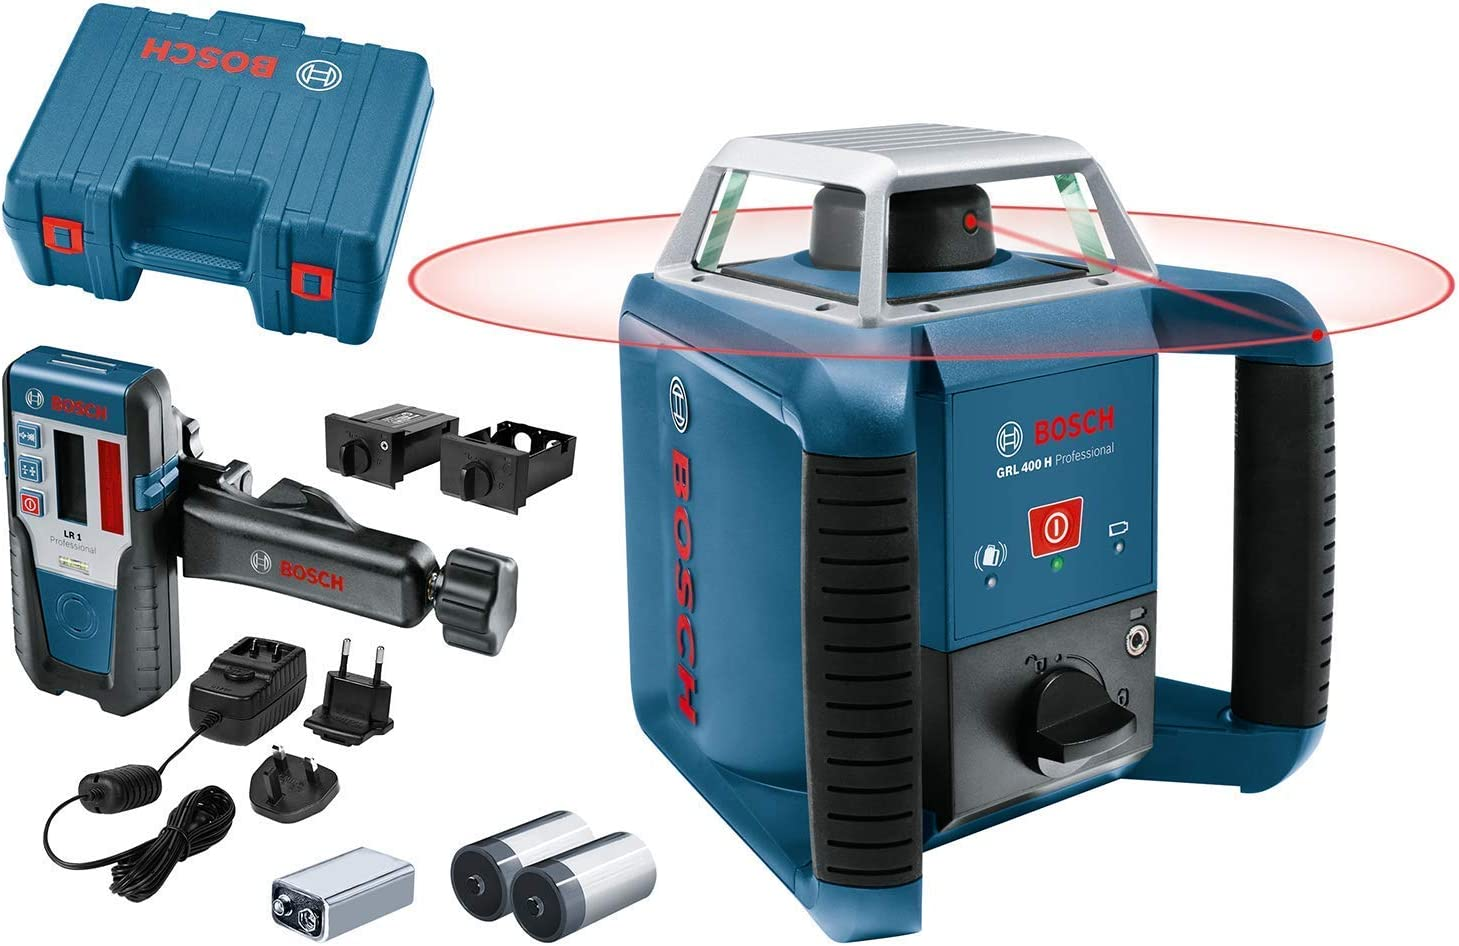 Nivelador l/áser Azul Bosch GRL 250 HV Professional 60 h, 1.8 kg